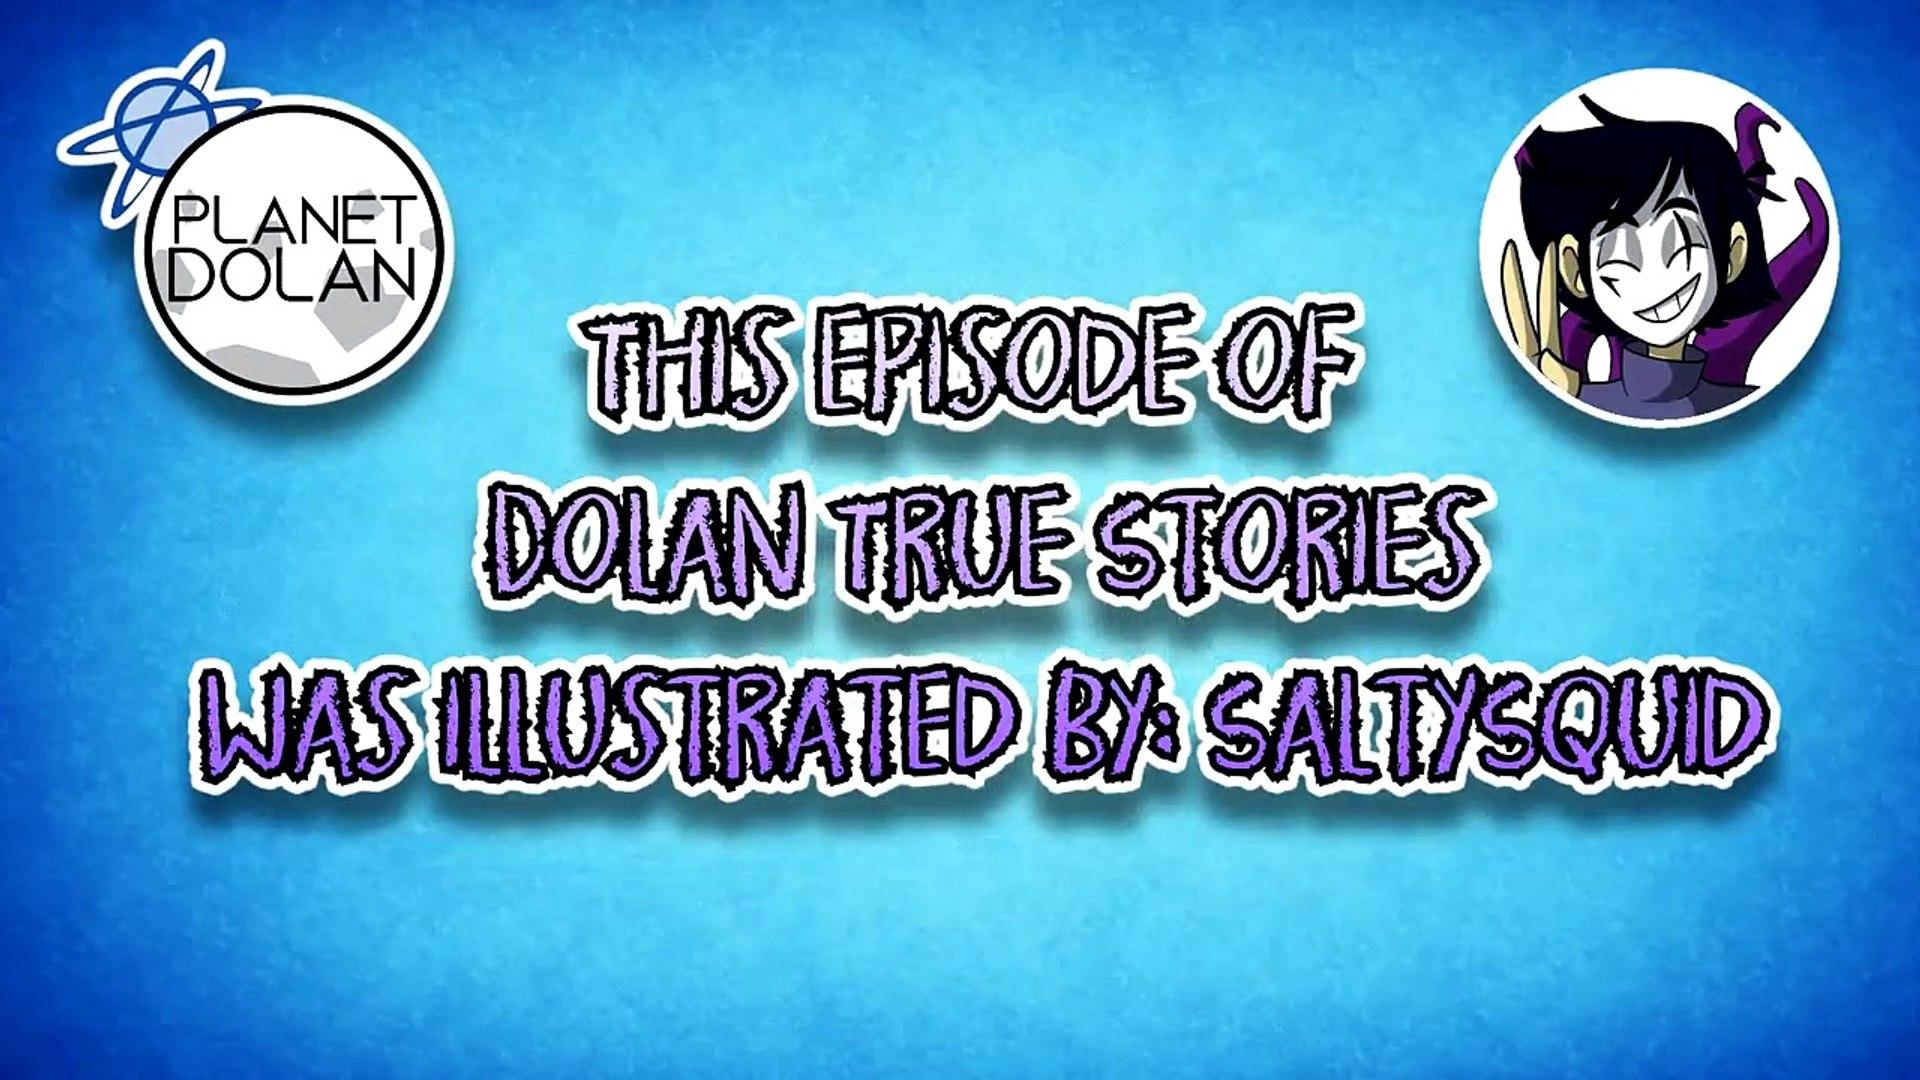 OUR WORST NIGHTMARES _ Dolan True Stories-1O